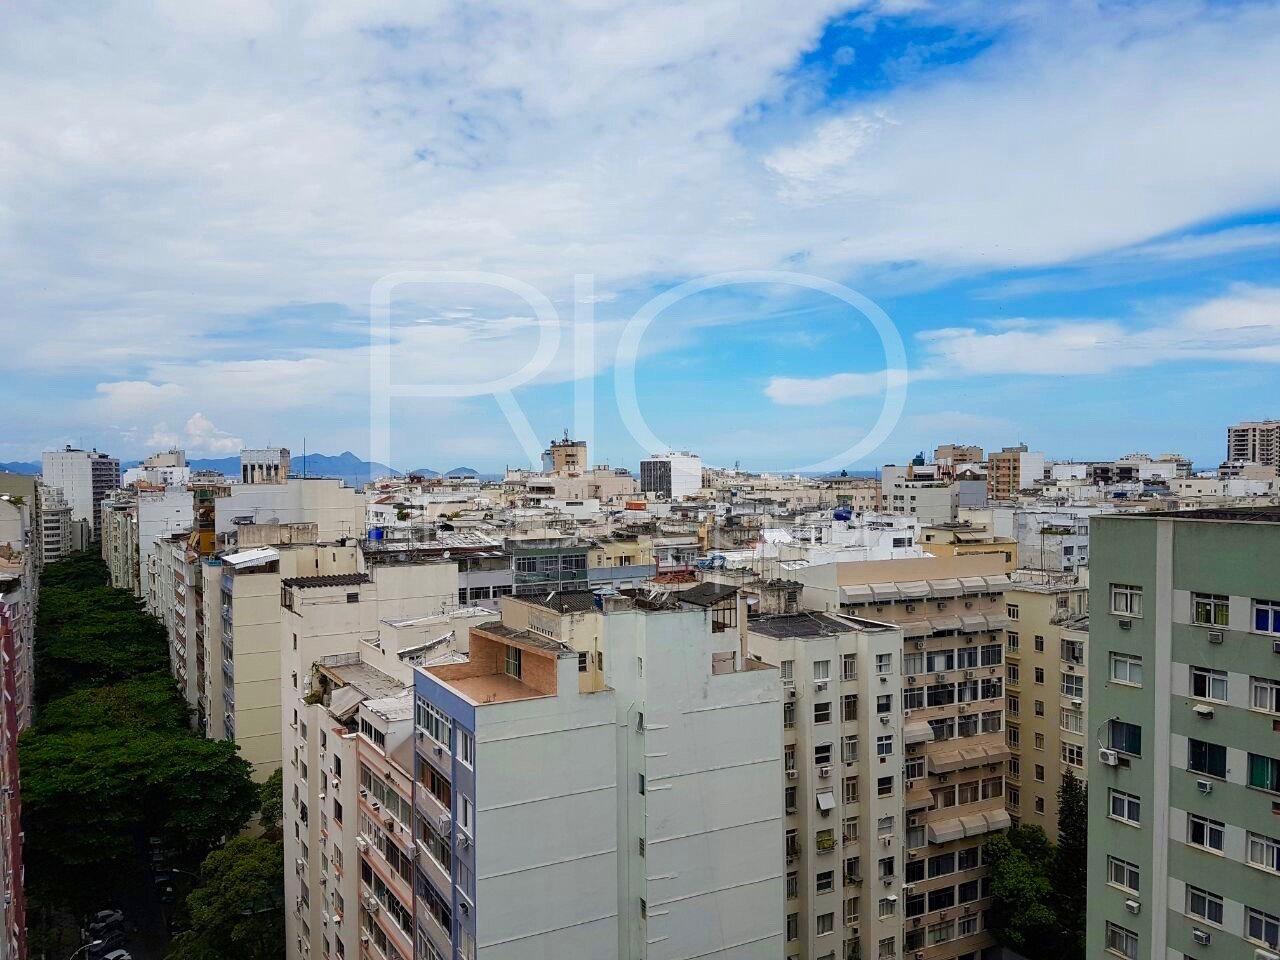 COPACABANA rue Saint Roman - nice apartment with a view.